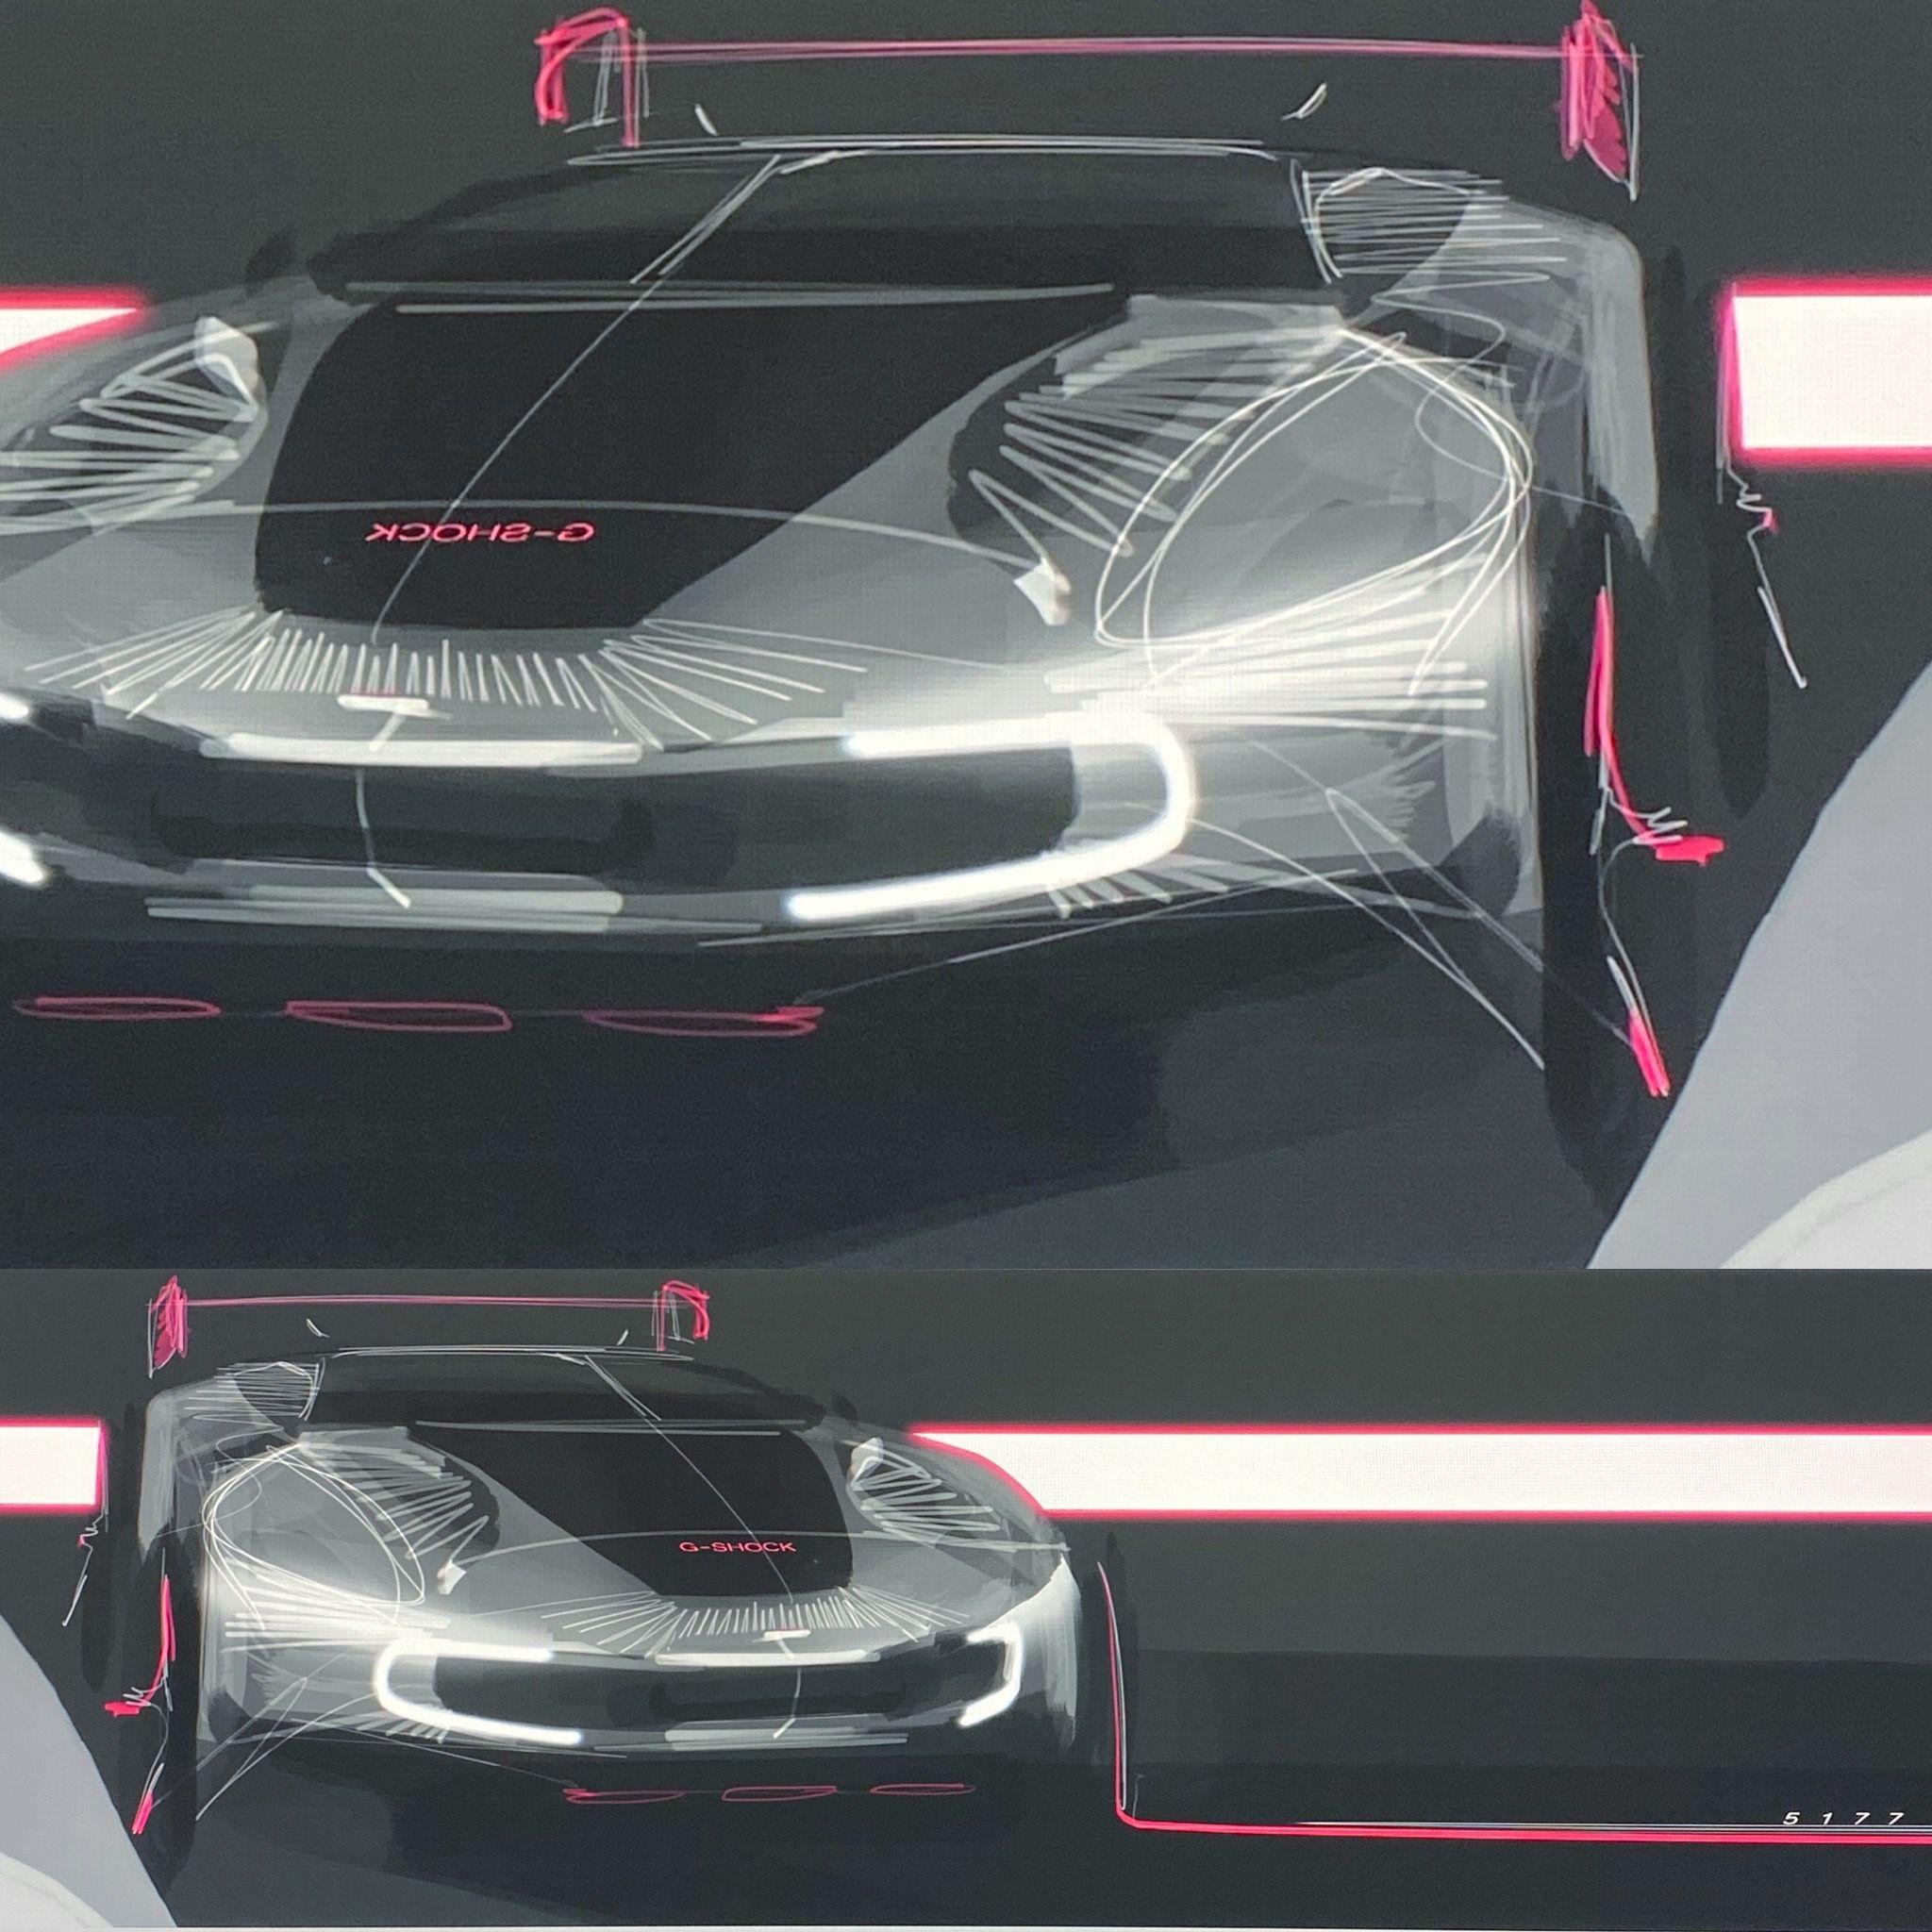 Concept5177 Car Design Automotive Design Car Exterior